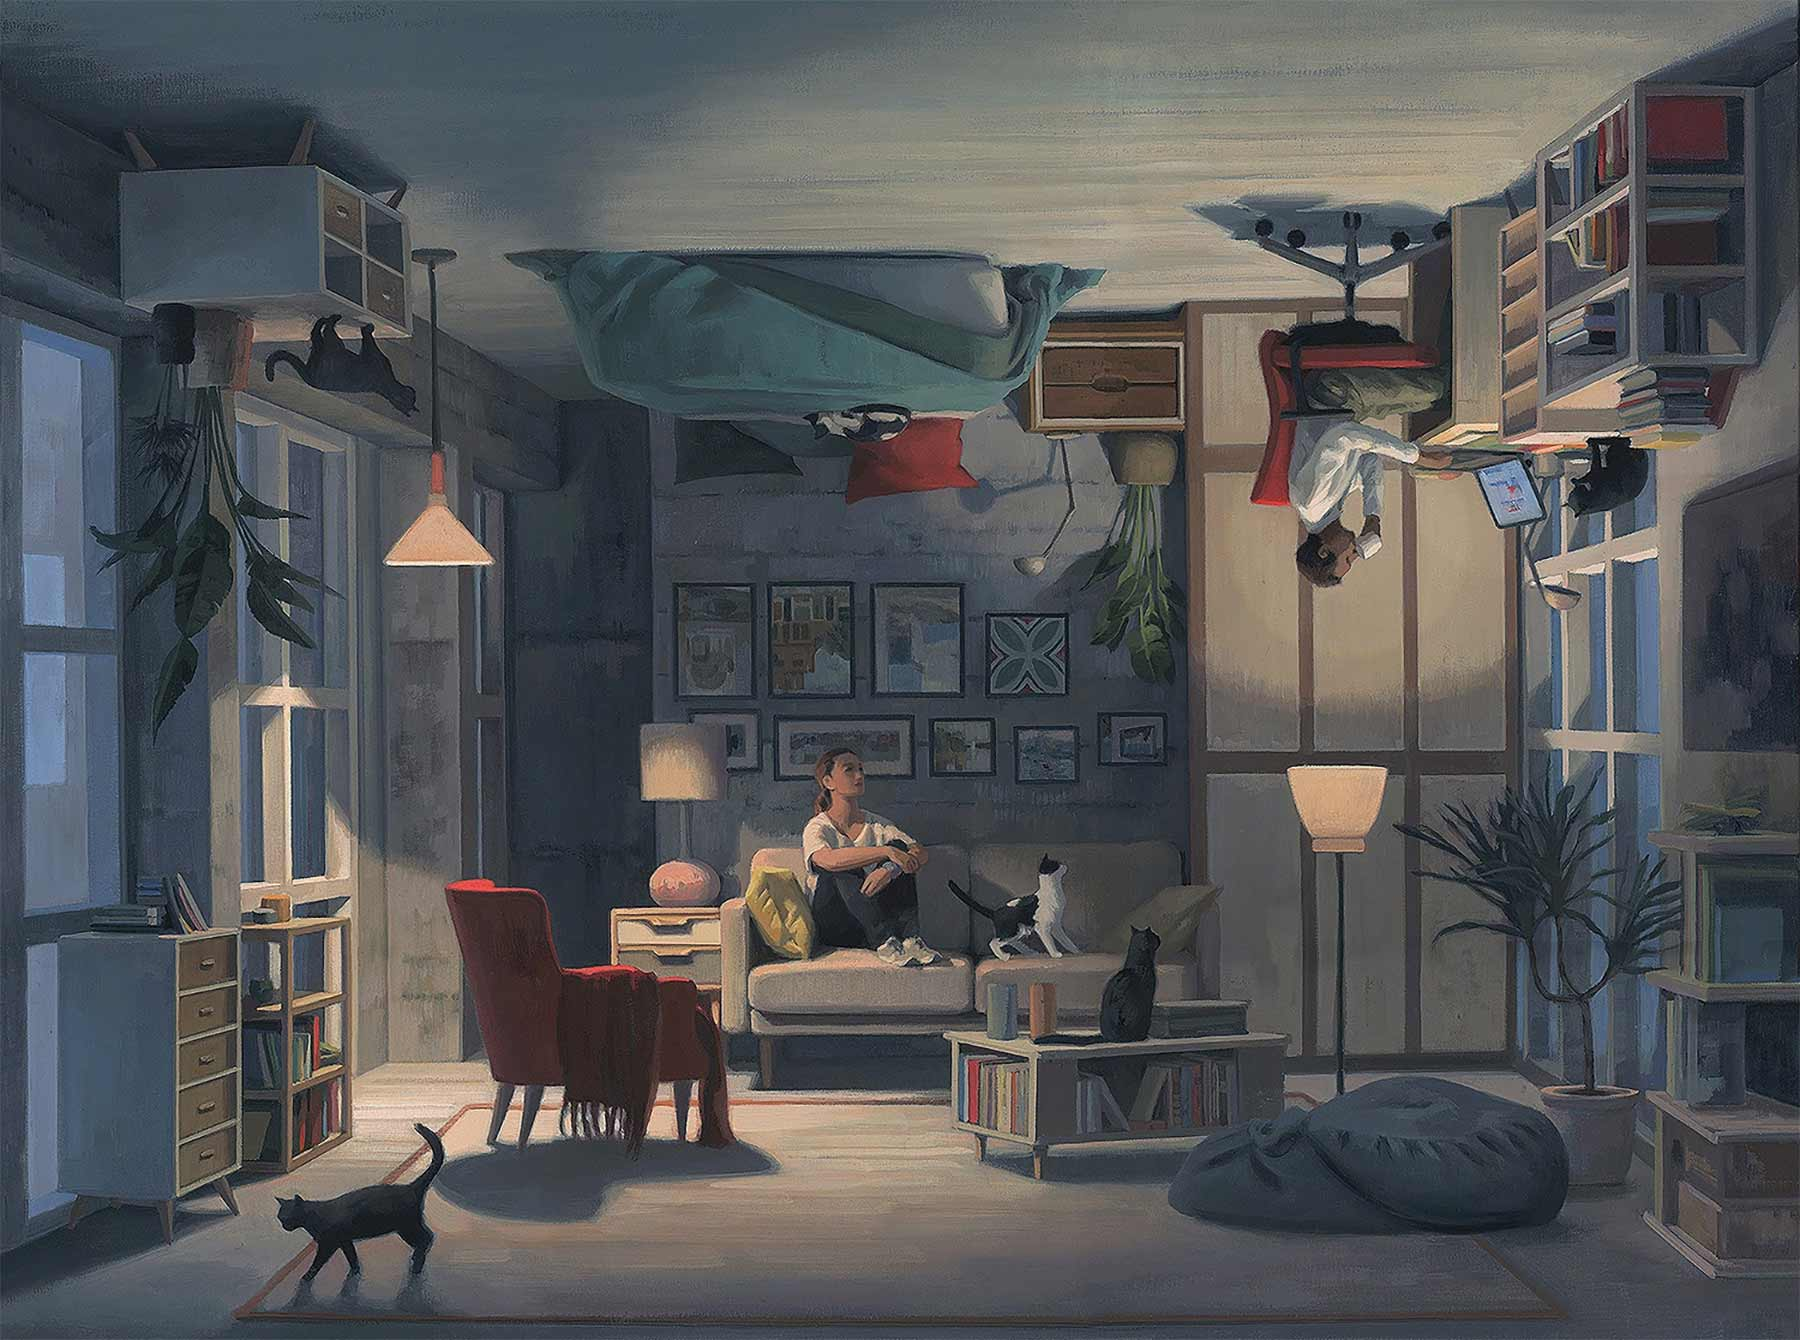 Malereien von Cinta Vidal Cinta-Vidal-malerei-2021